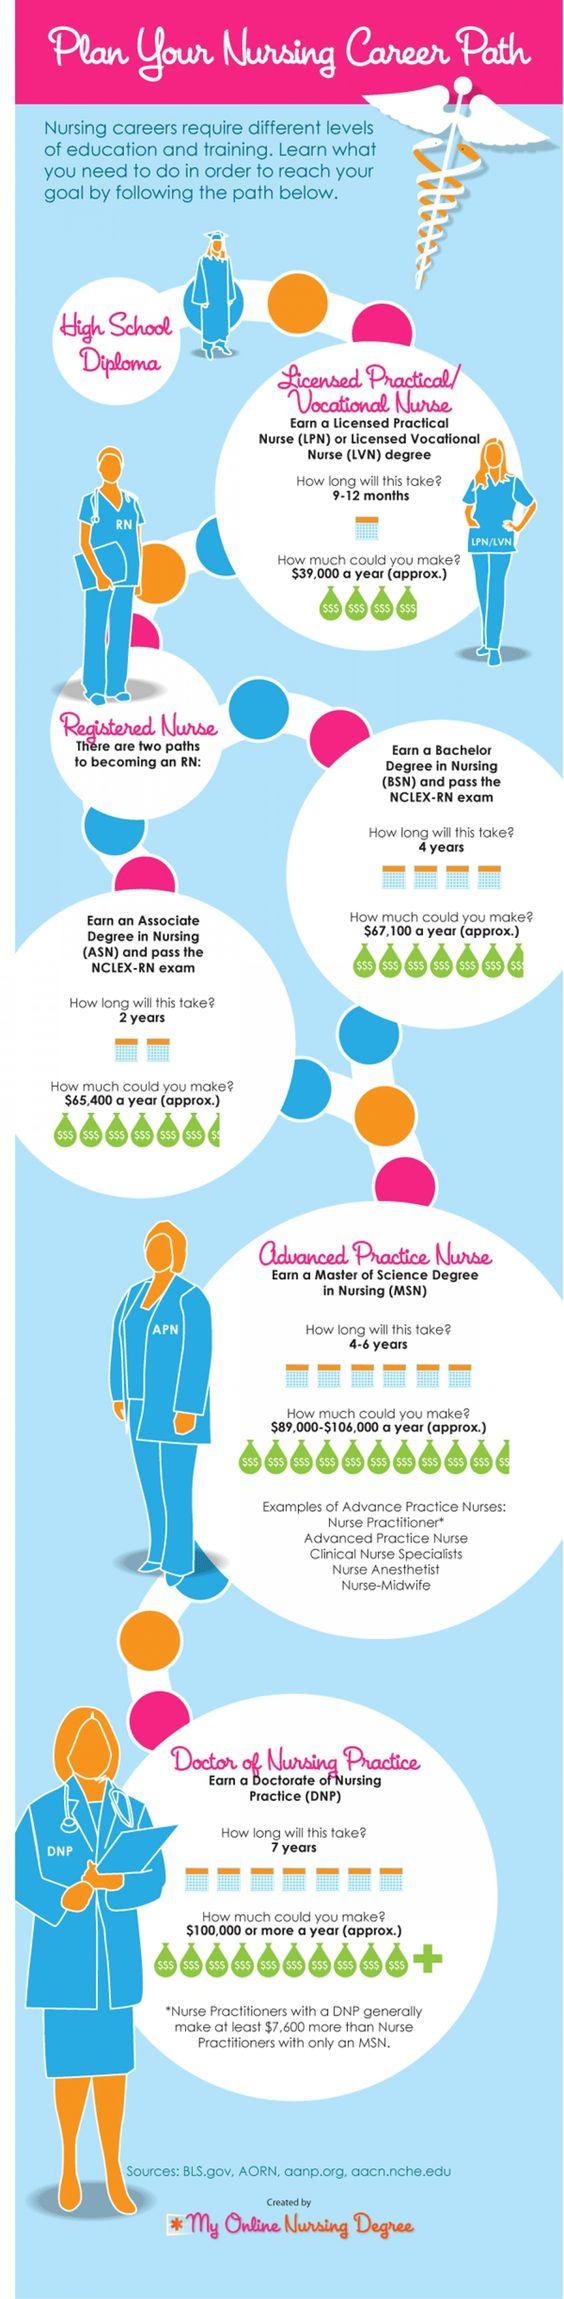 How can i show pharmacy technician job helped me pursue a nursing career?